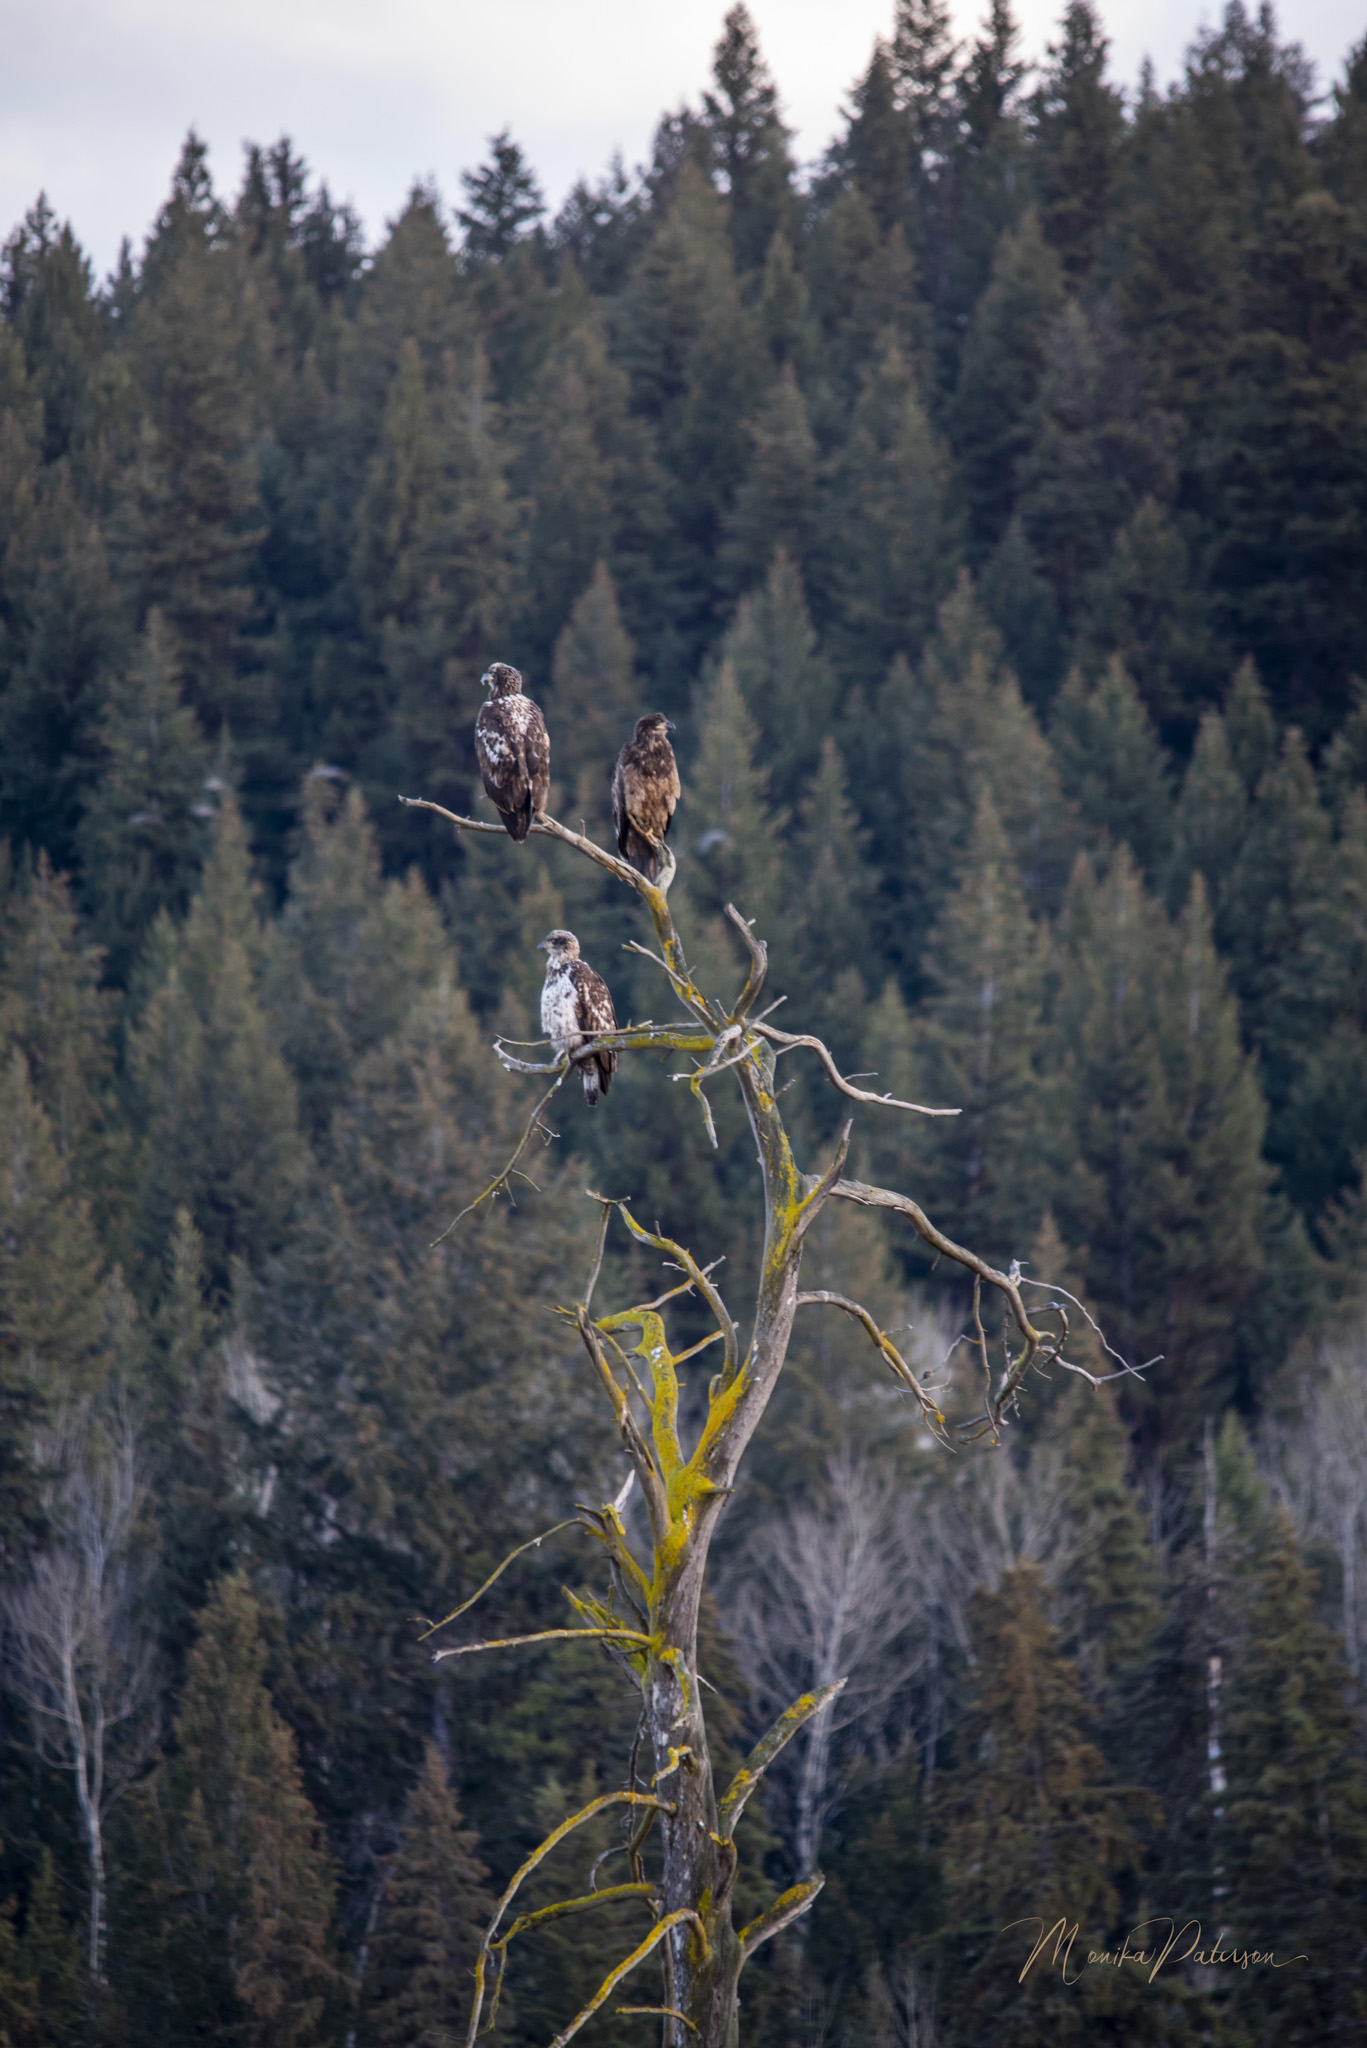 Three in the Tree - Monika Paterson